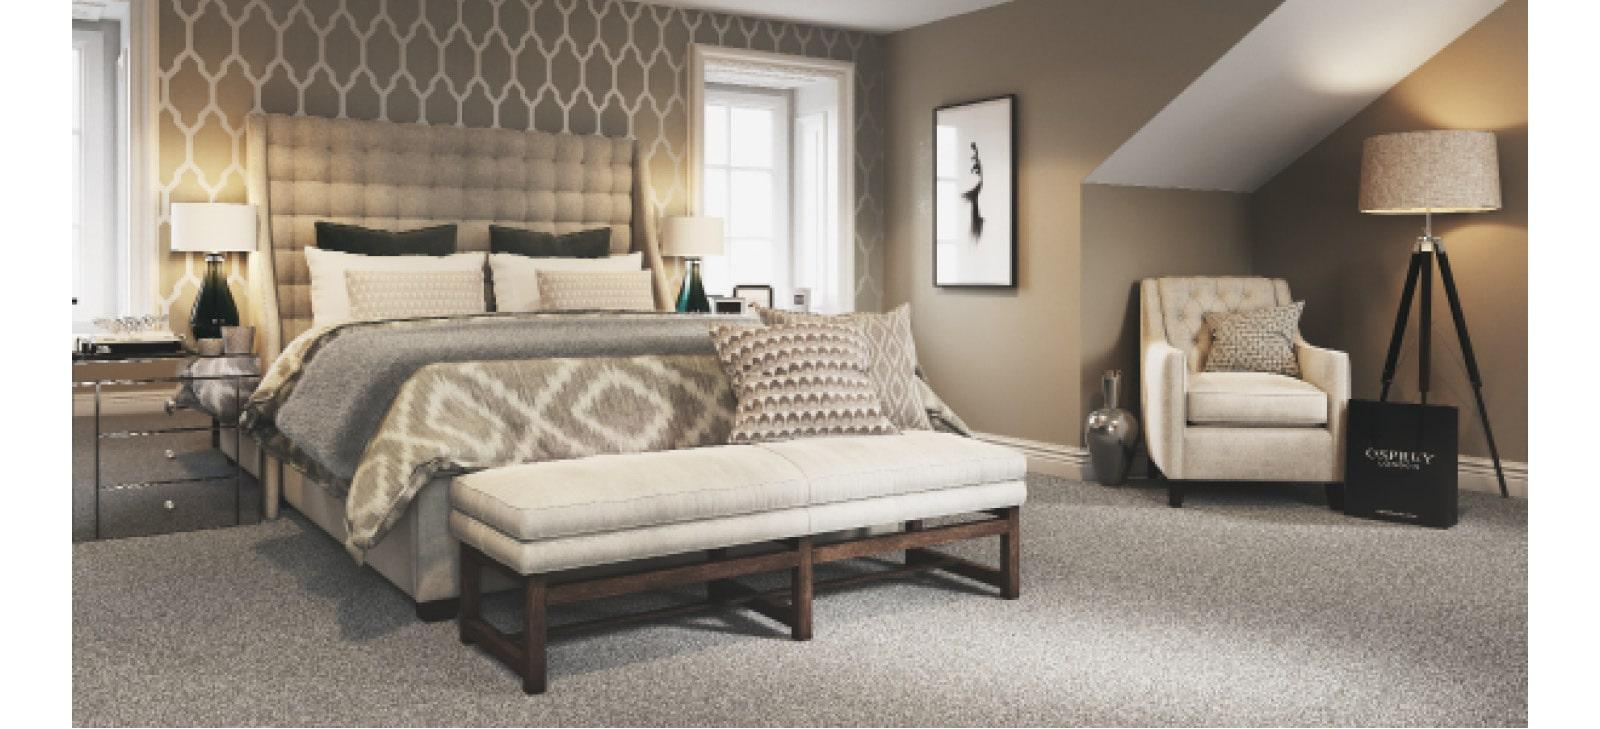 Grey carpet, neutral coloured bedroom